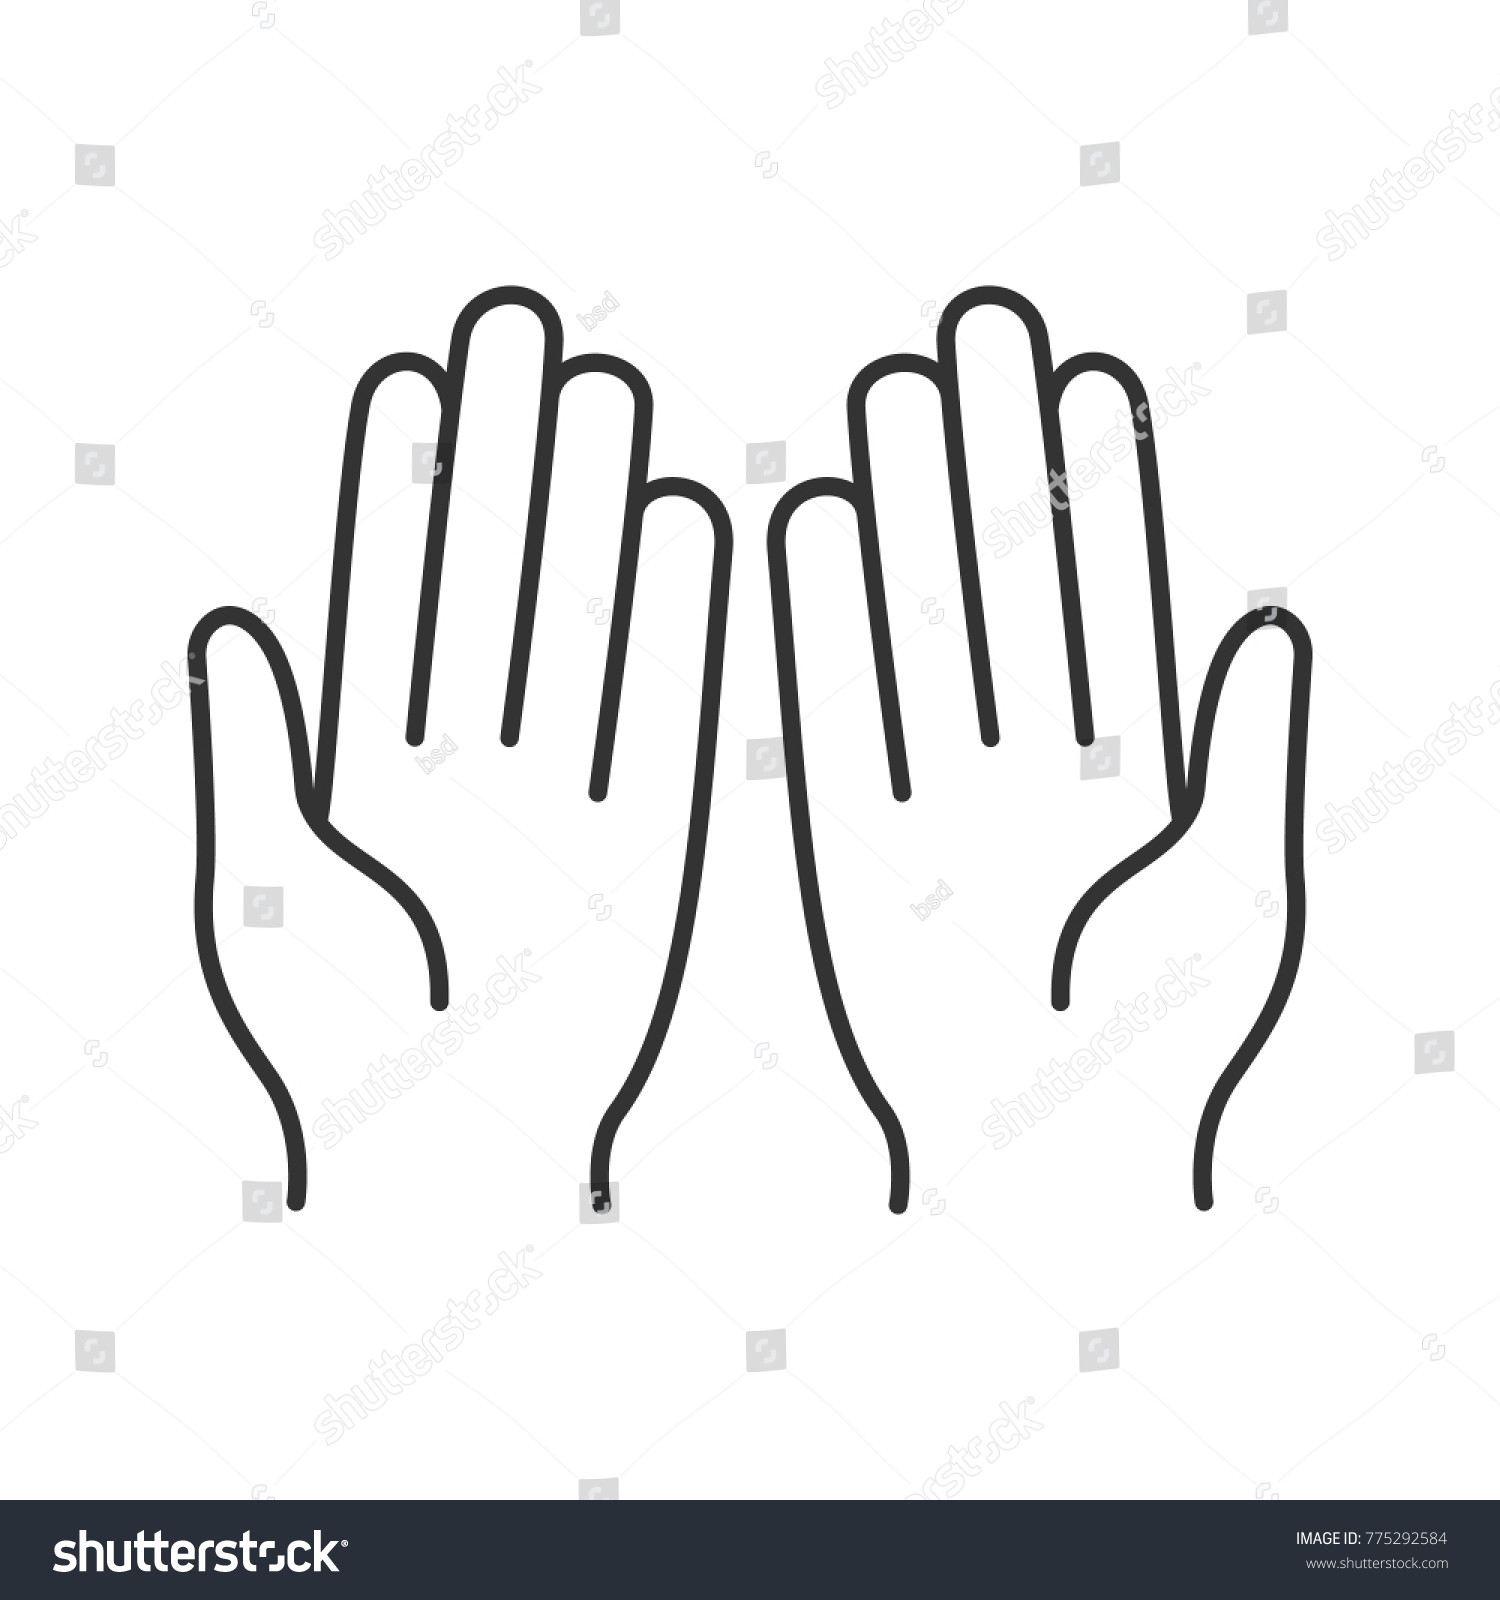 Muslim Praying Hands Linear Icon Thin Stock Illustration 775292584